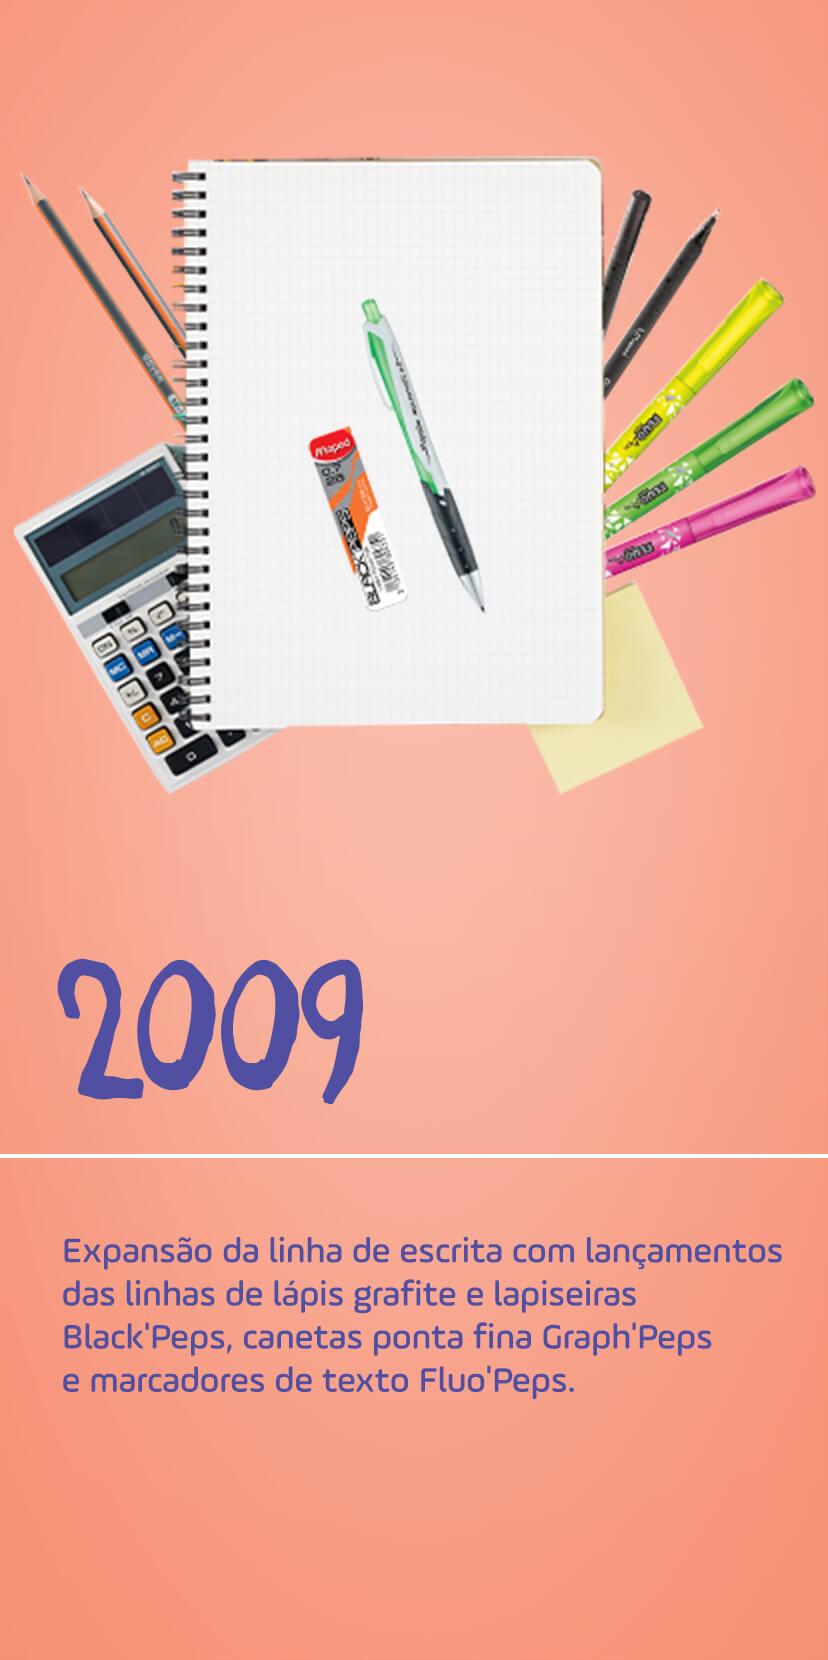 07 mobile 2009